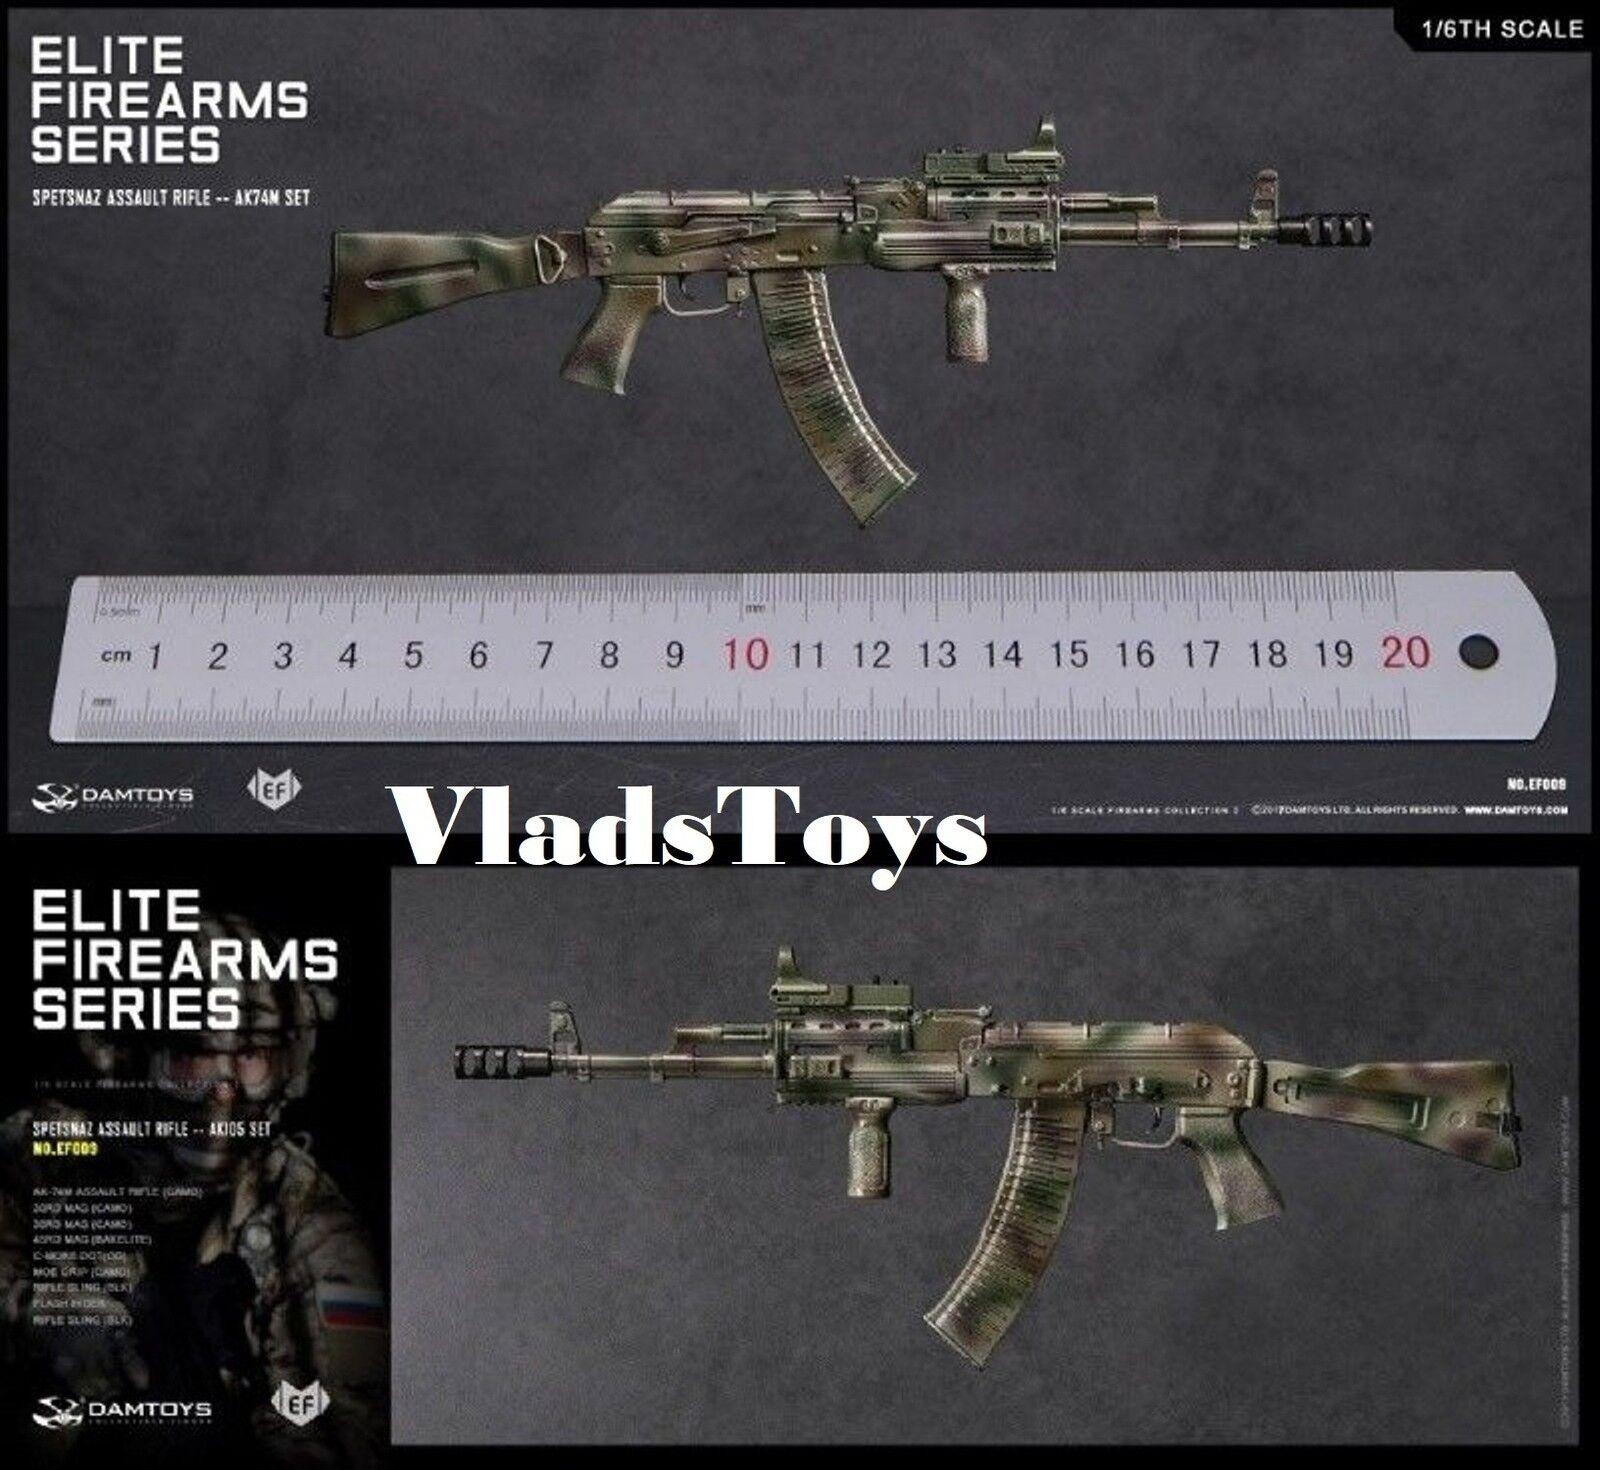 Spetsnaz Assault Rifle AK74M Set 1 6 DamToys Elite Firearms Series 2 EF009 USA